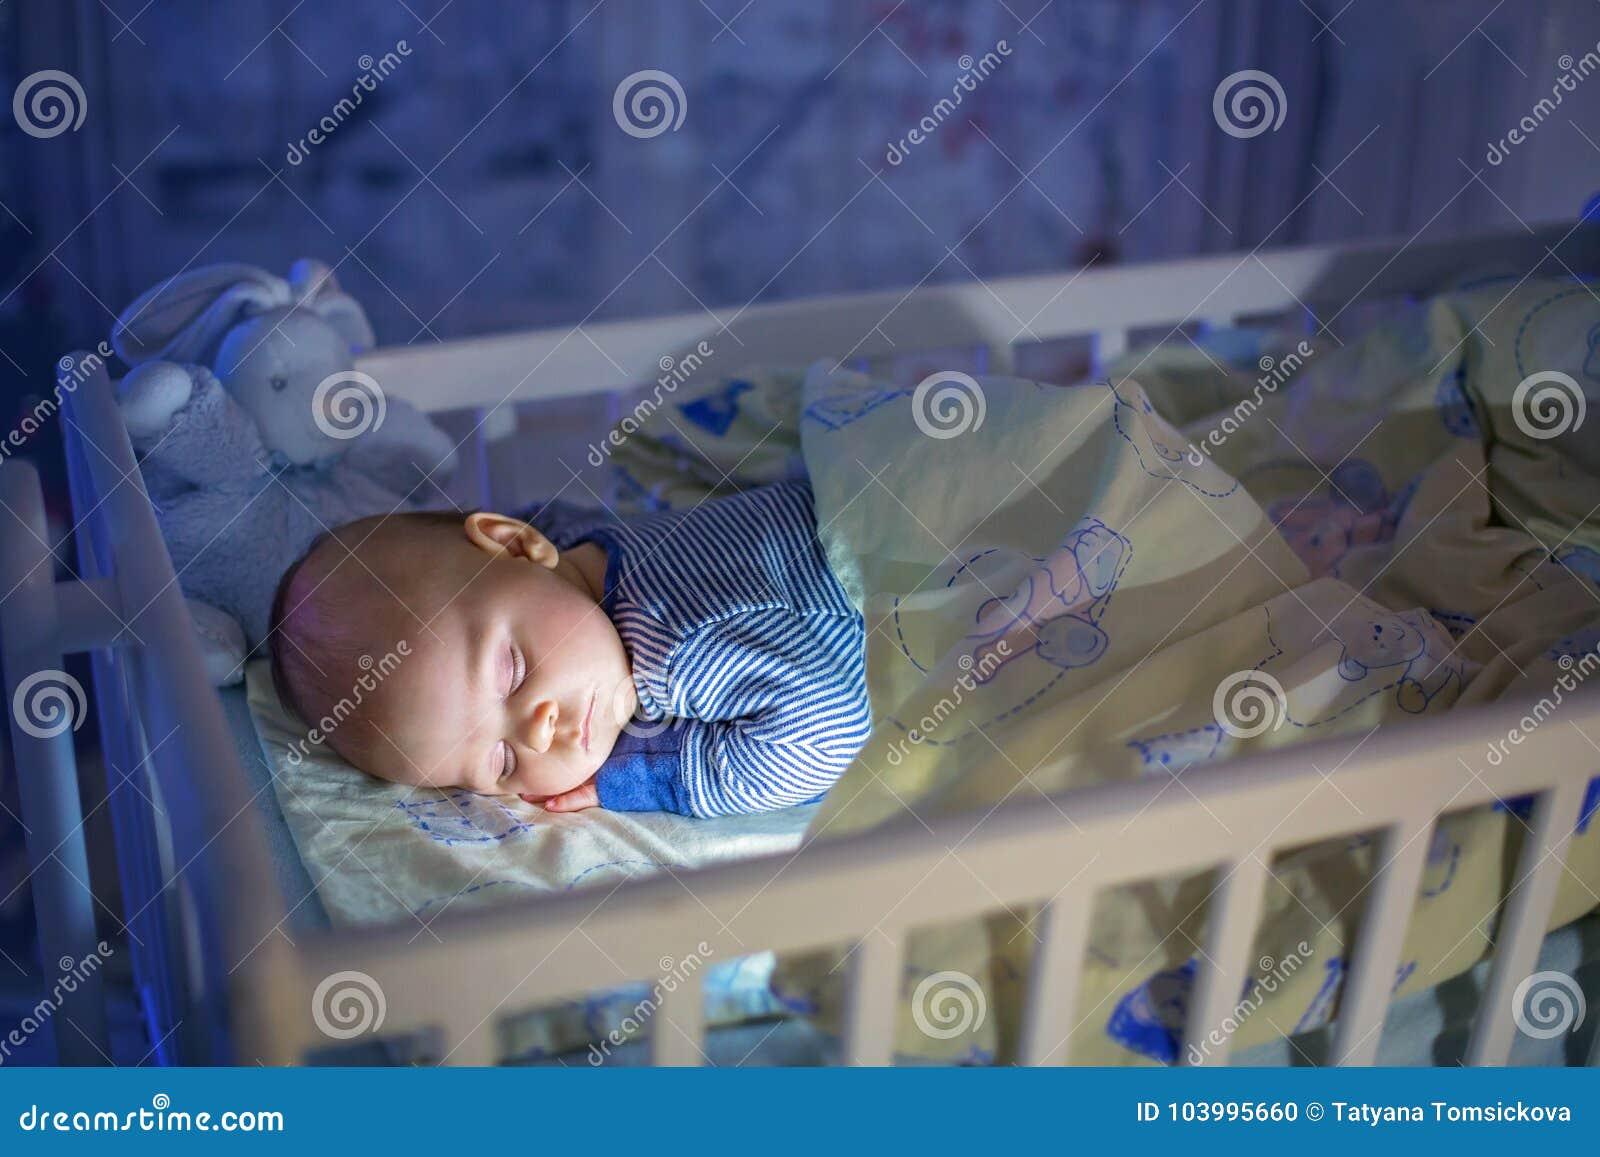 Newborn Baby Sleeping Dark Room